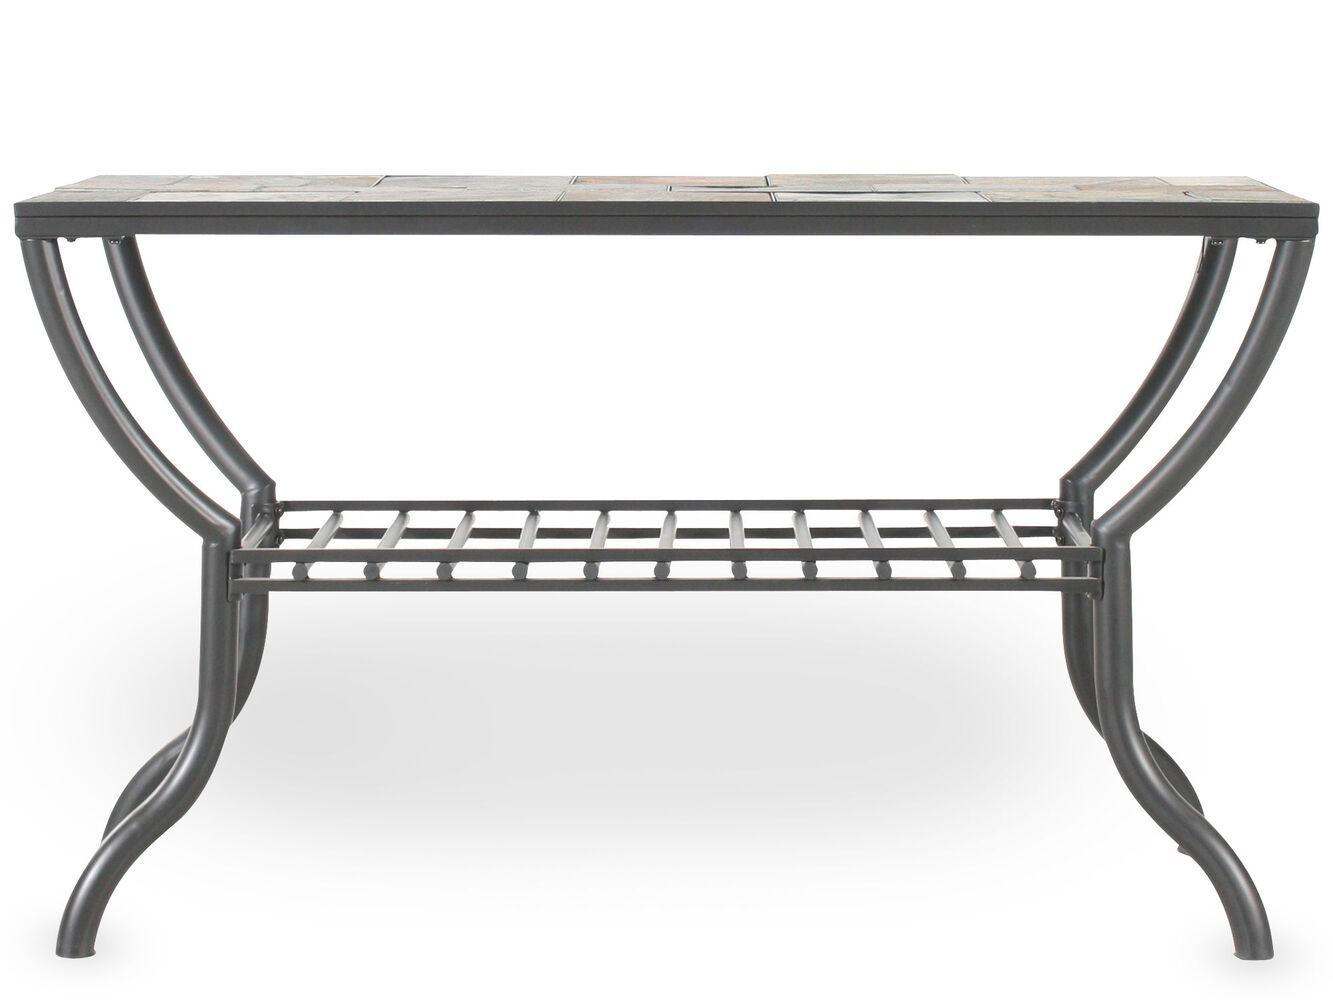 Grilled shelf contemporary sofa table in gun metal mathis grilled shelf contemporary sofa table in gun metal geotapseo Gallery